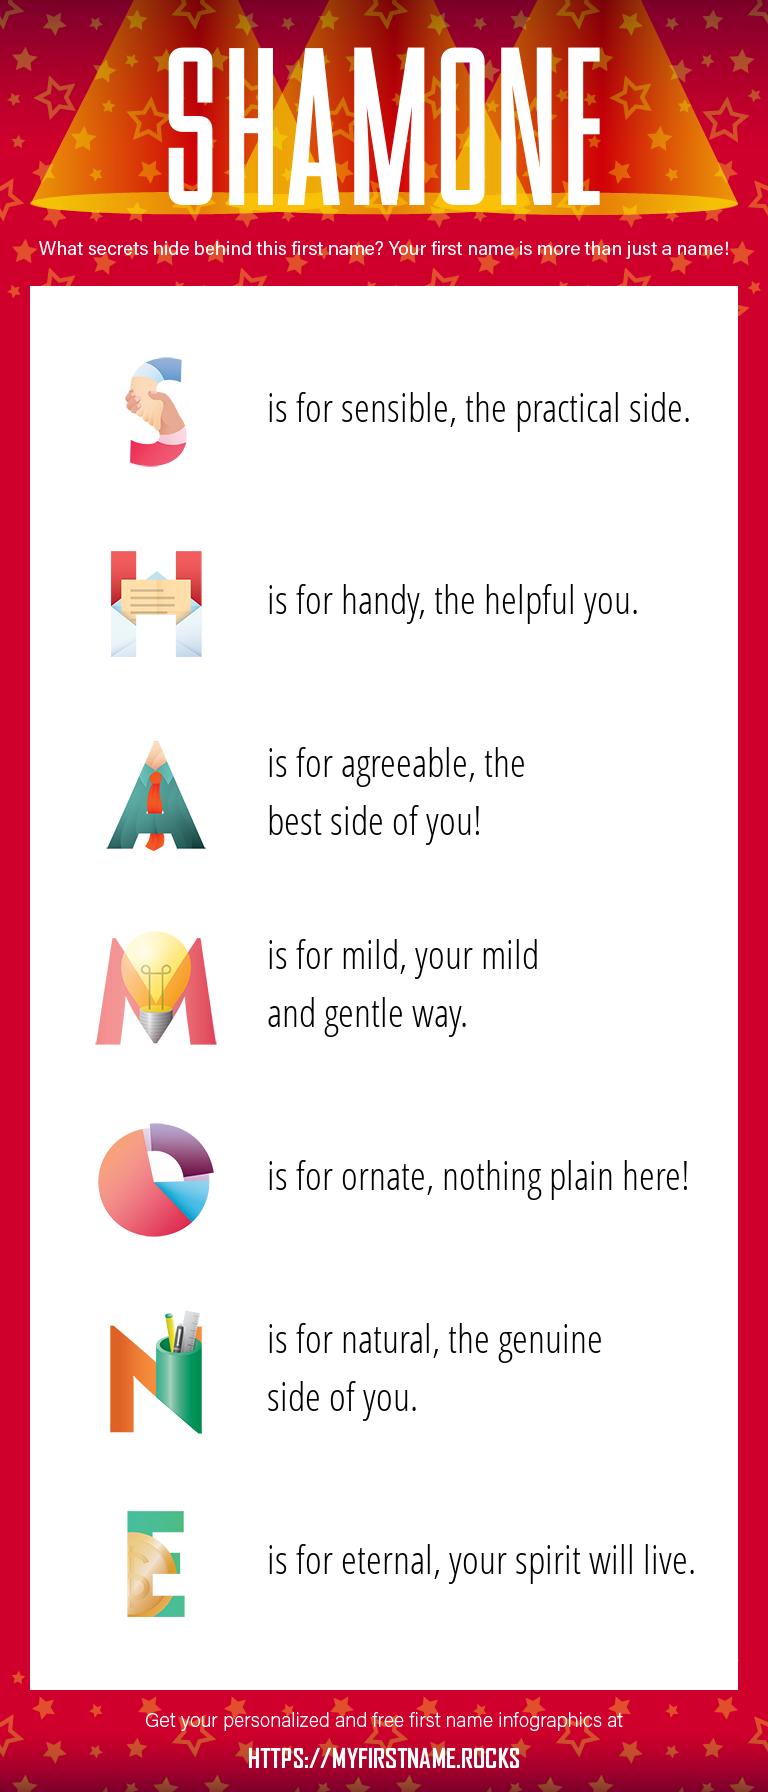 Shamone Infographics